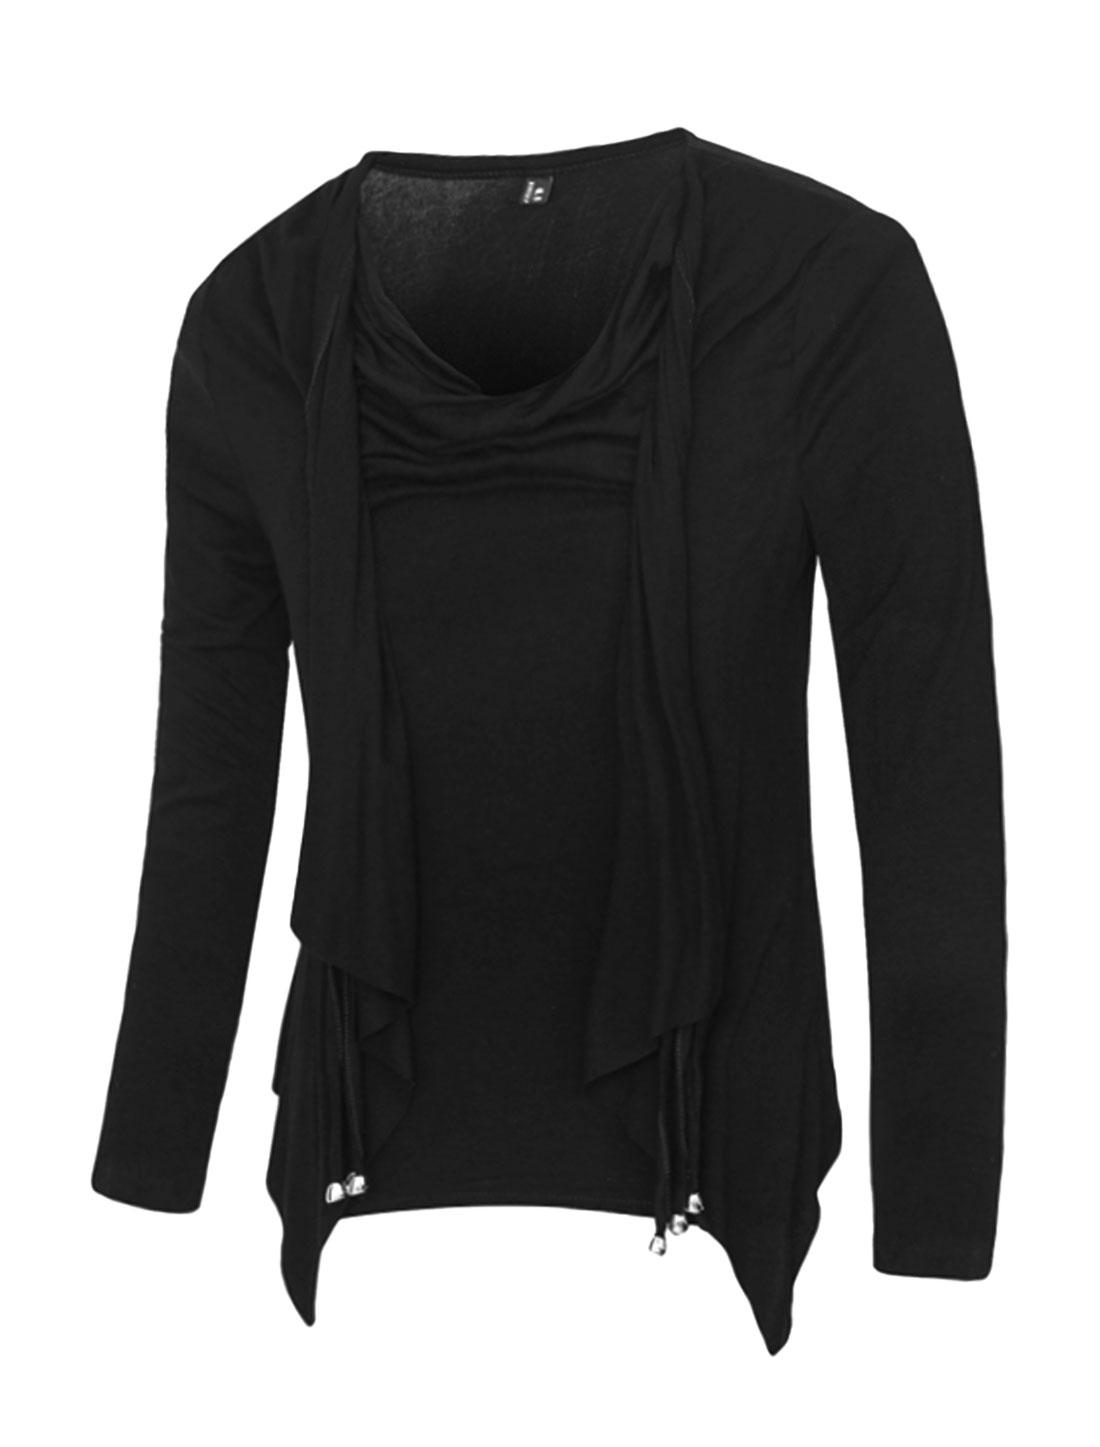 Men Cowl Neck Draped Layered Design Slim Fit T-Shirt Black M